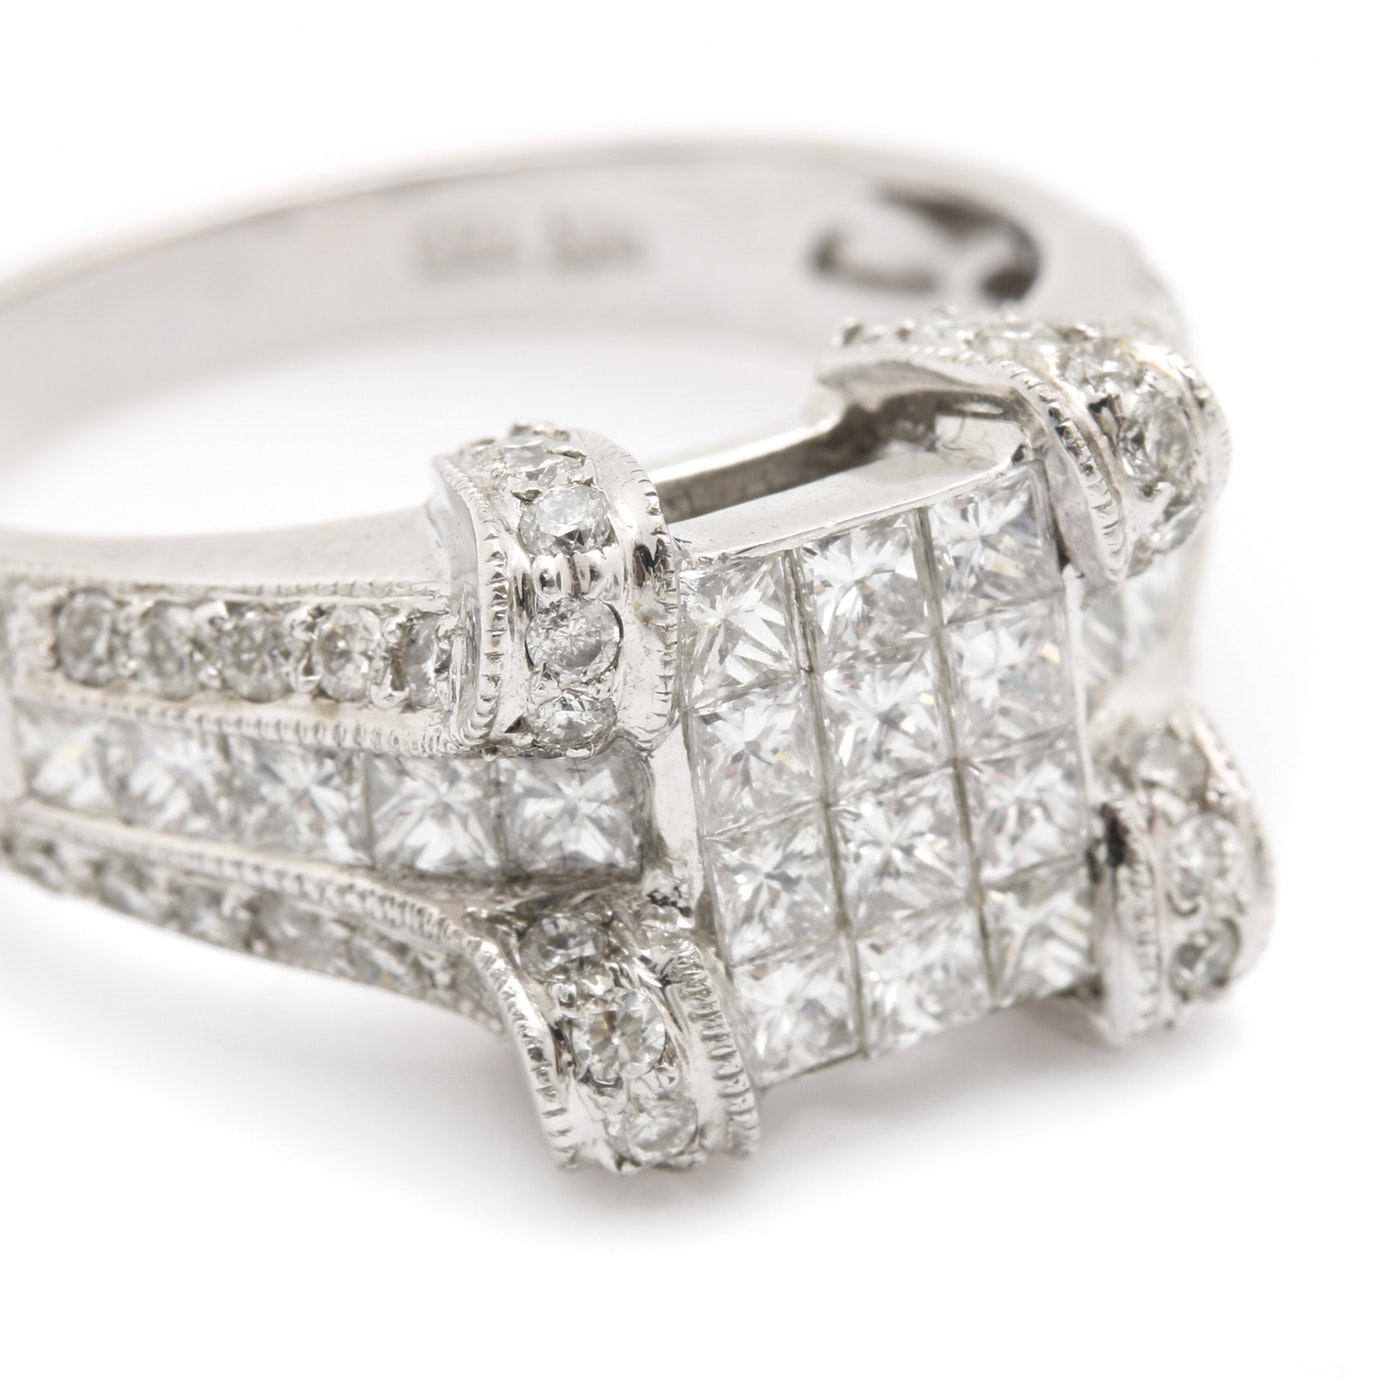 18K White Gold 1.75 CTW Diamond Ring | EBTH